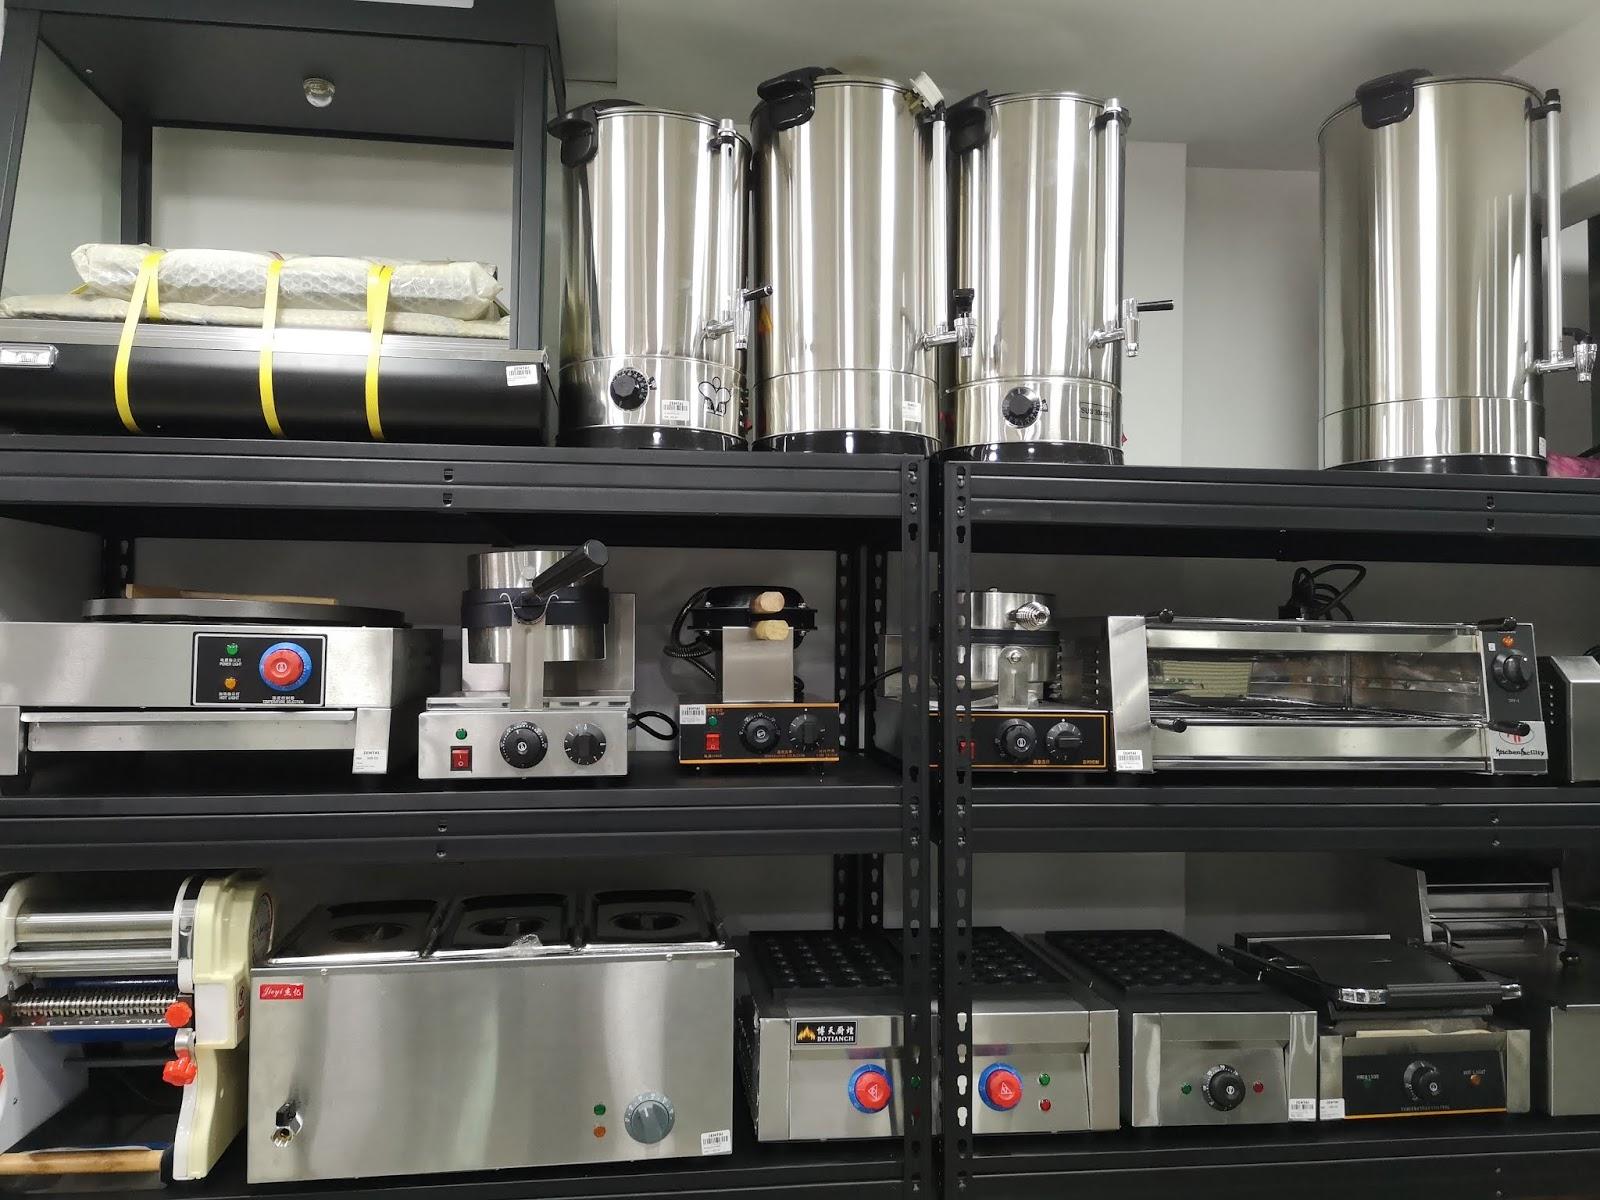 Kedai Menjual Peralatan Dapur  Desainrumahid.com